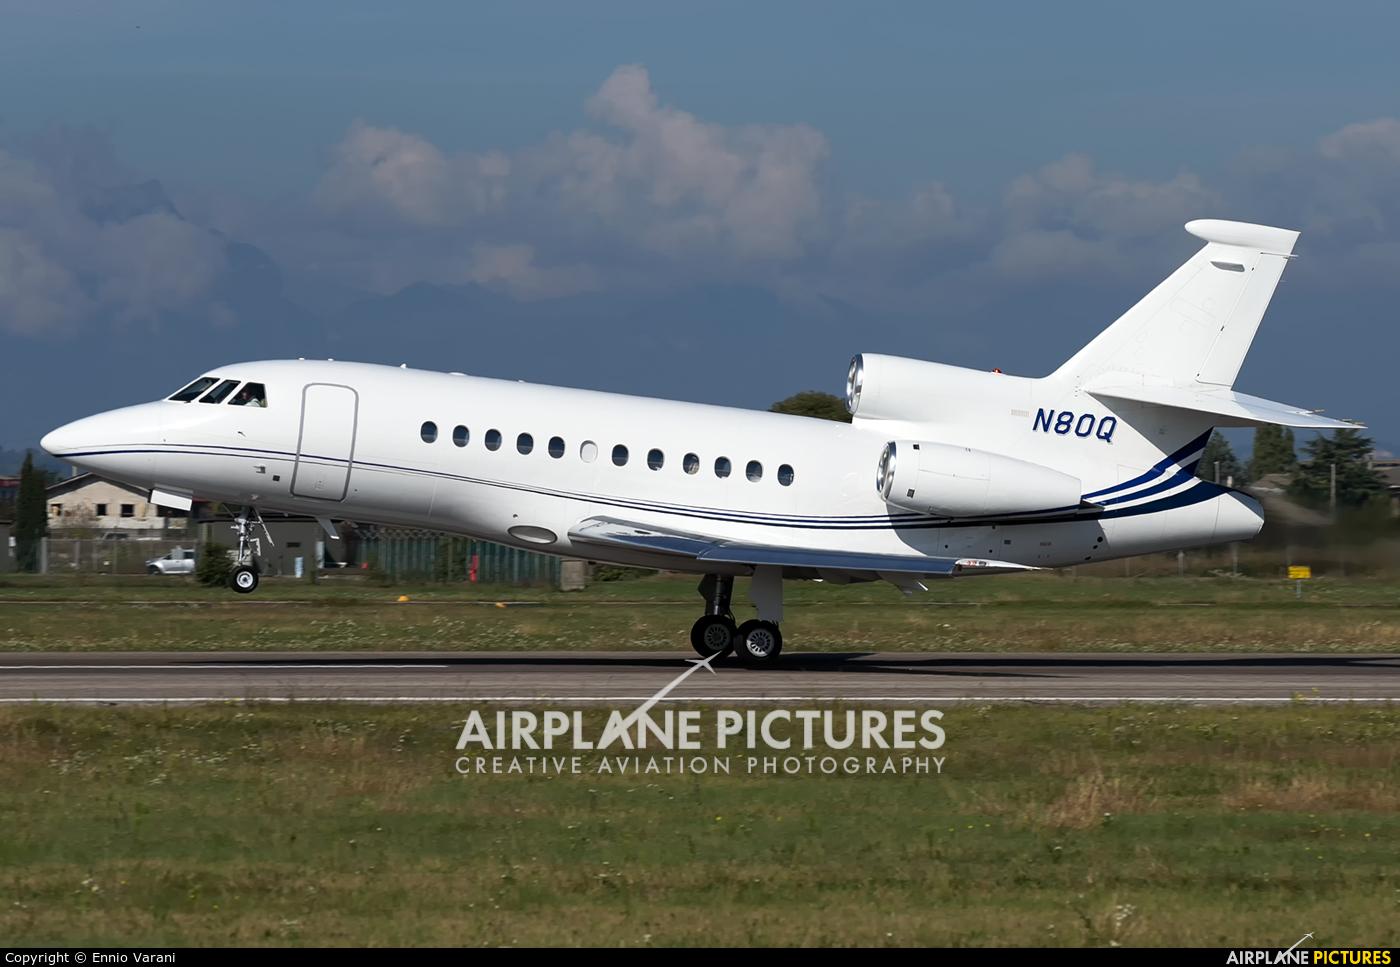 United States Steel Corporation N80Q aircraft at Verona - Villafranca